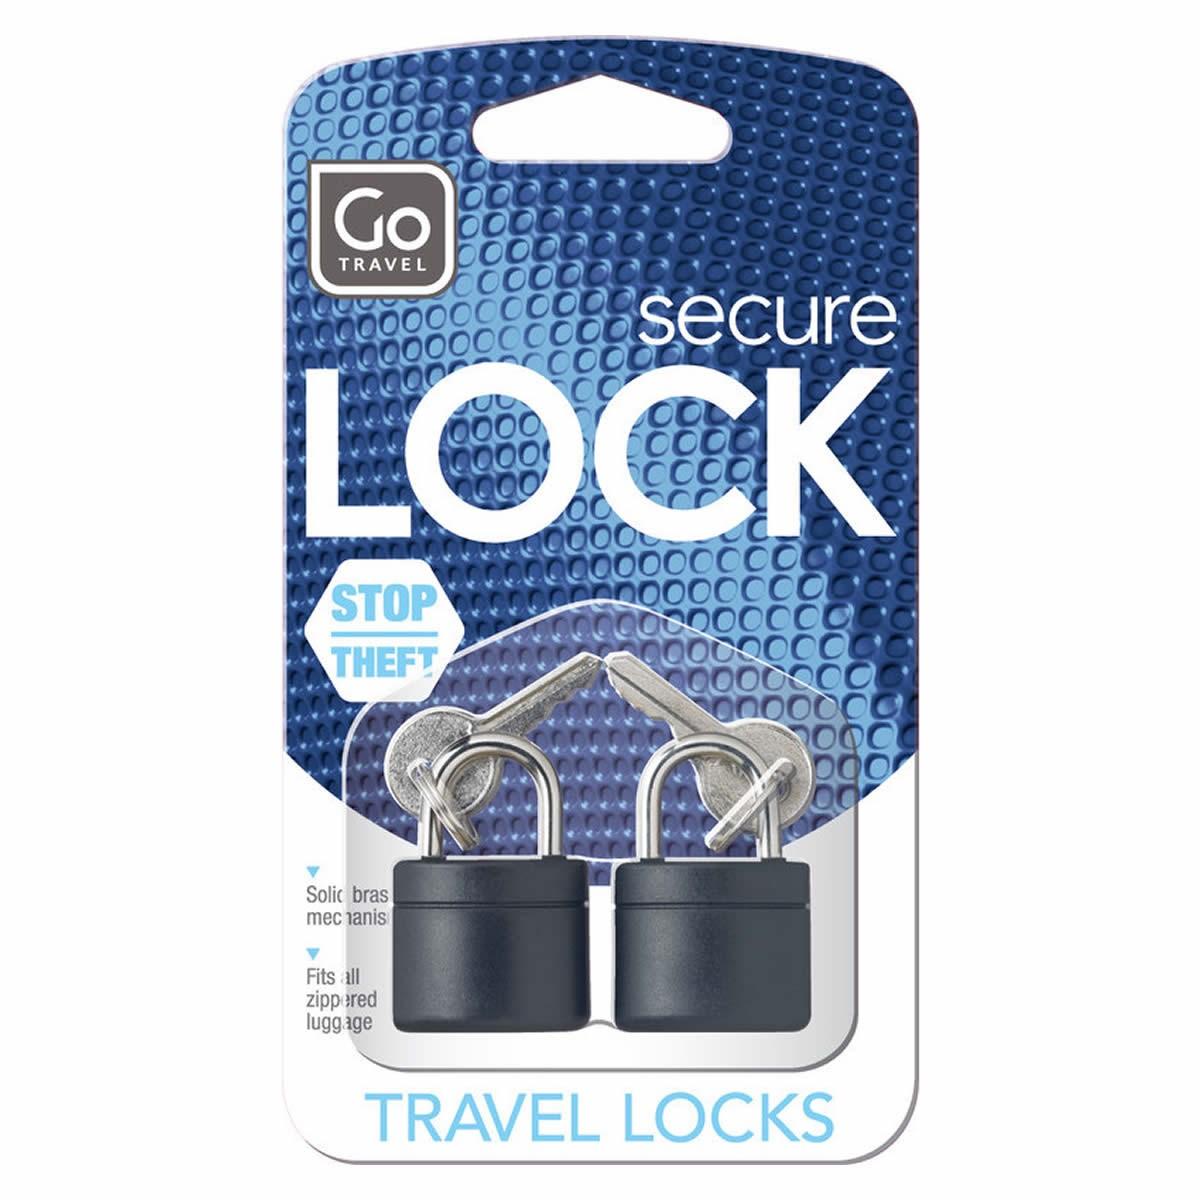 Go Travel Travel Locks